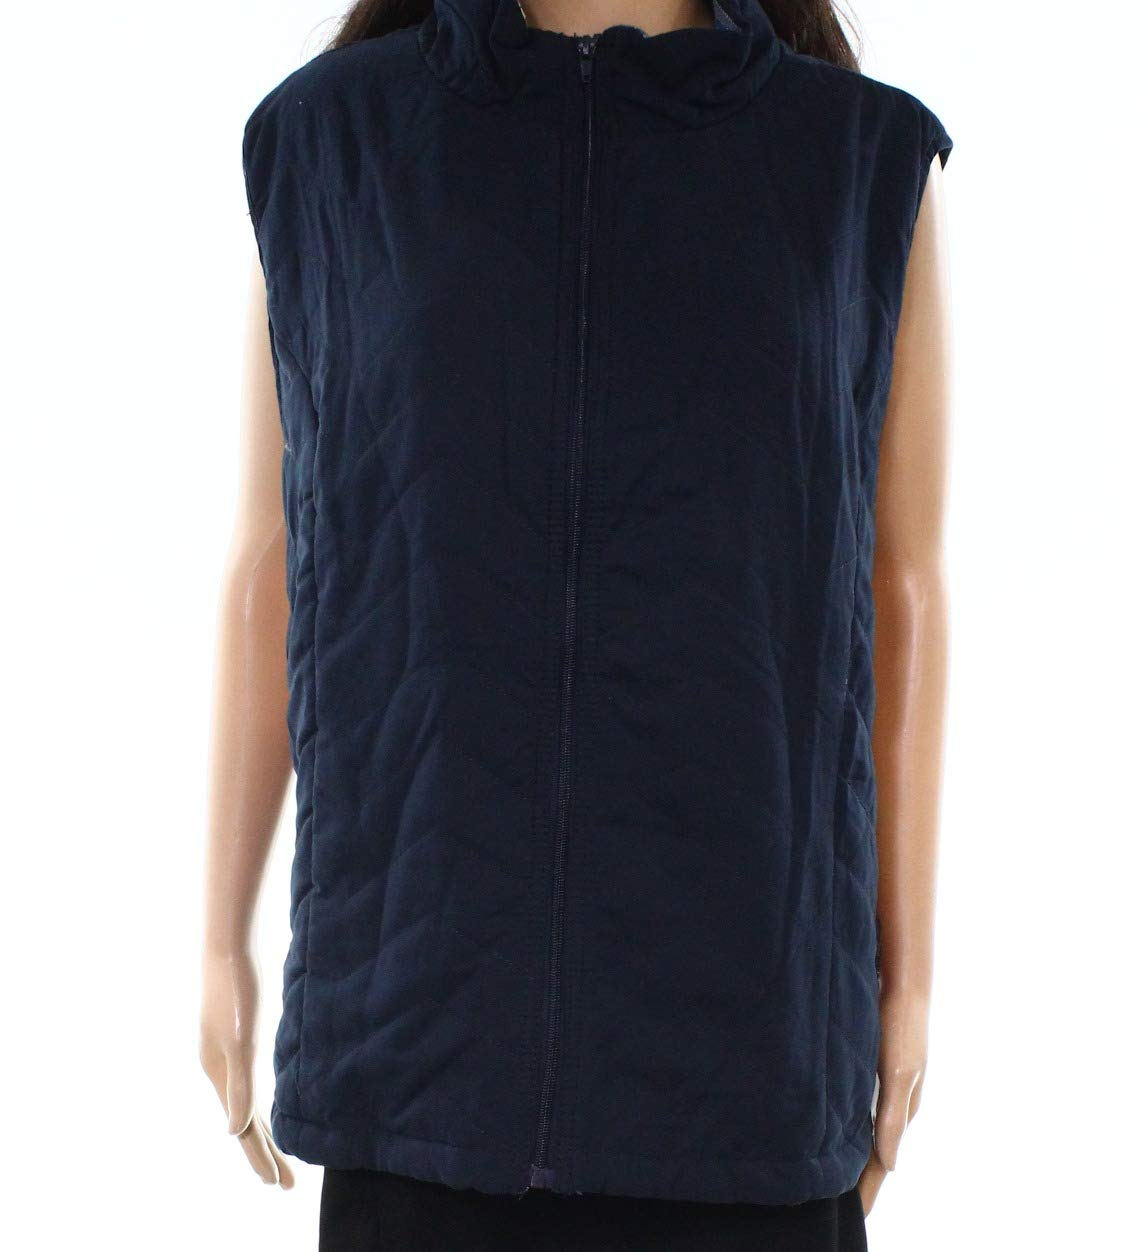 UNIONBAY Supplies Womens Plus Quilted Vest Jacket Blue 2X